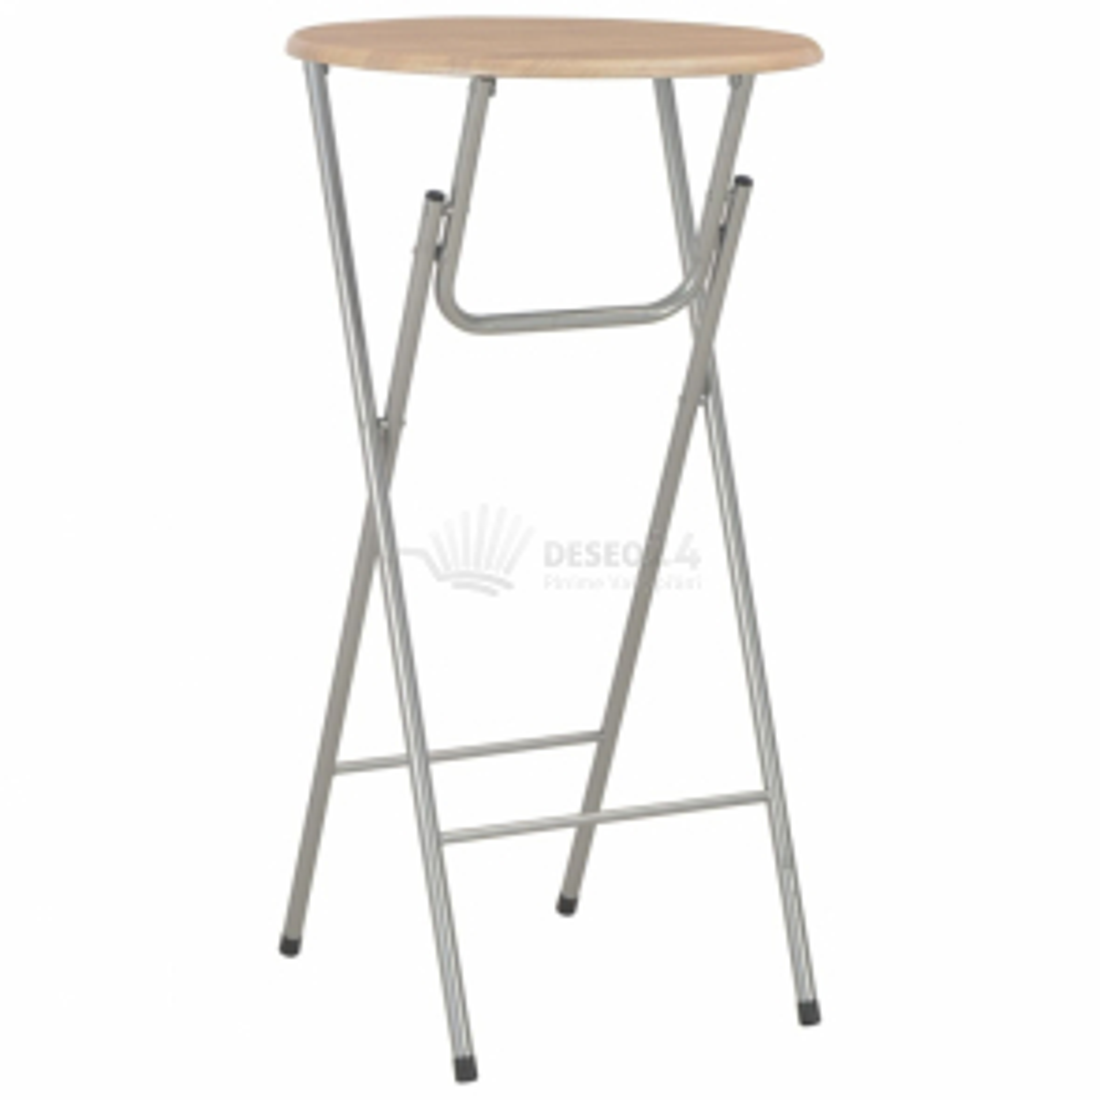 vidaXL Barový stůl dubový odstín 60 x 112 cm MDF [284392]